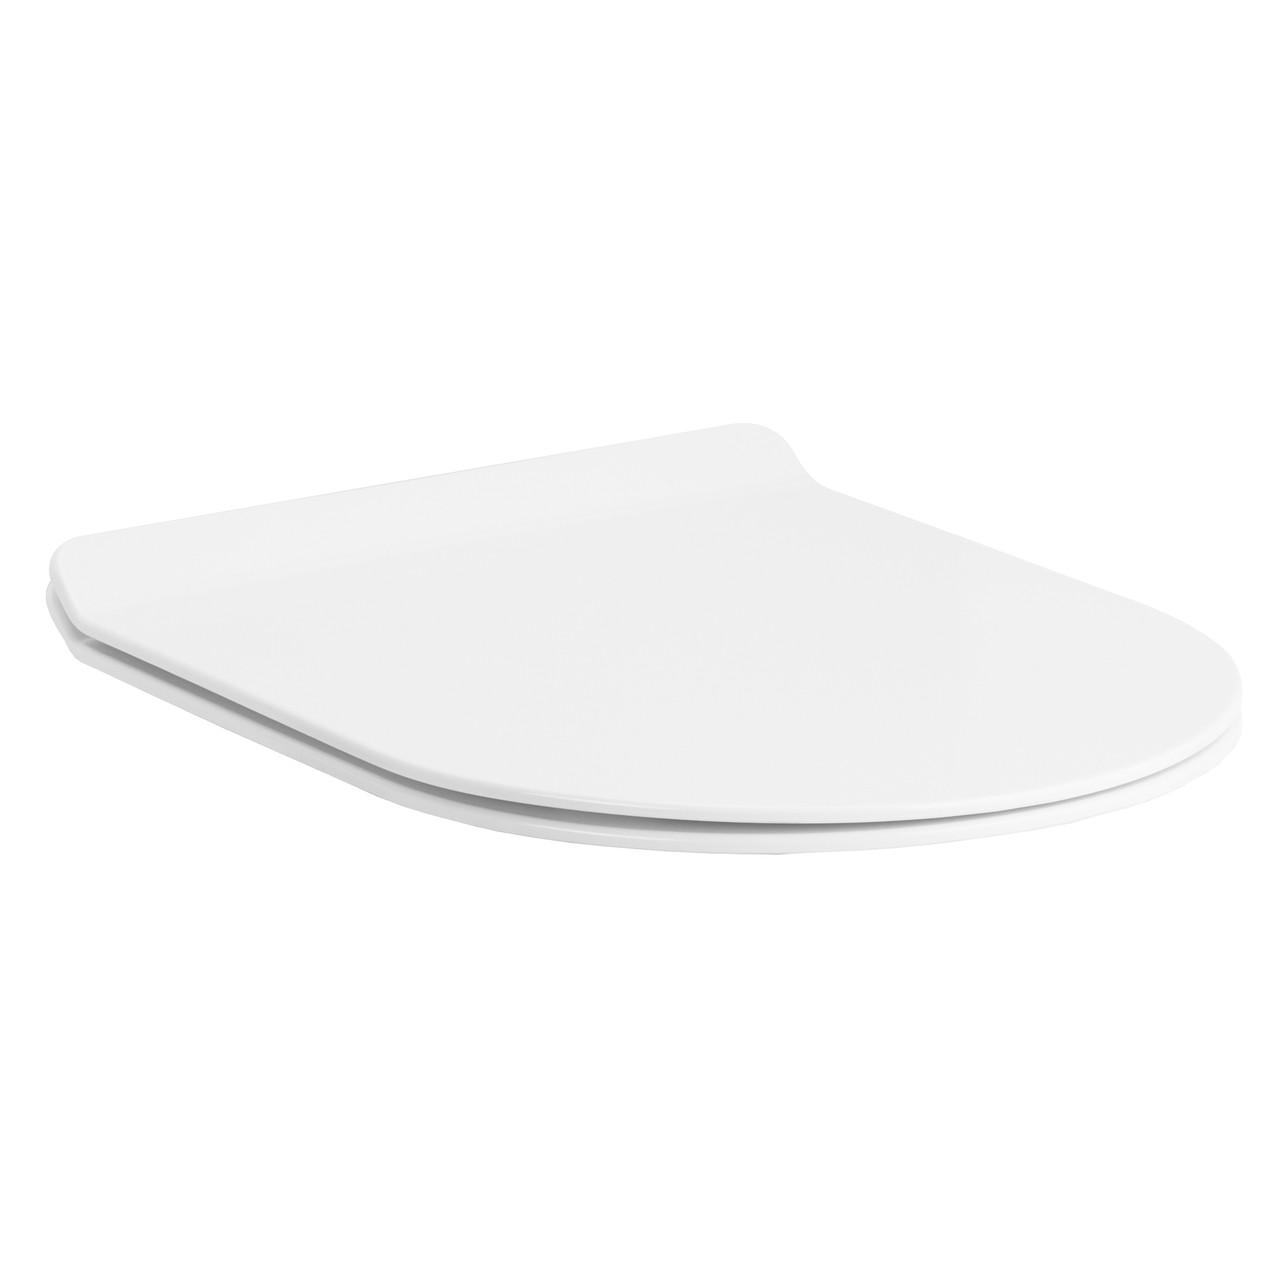 ALTEA/AIVA сиденье для унитаза Duroplast Slim slow-closing